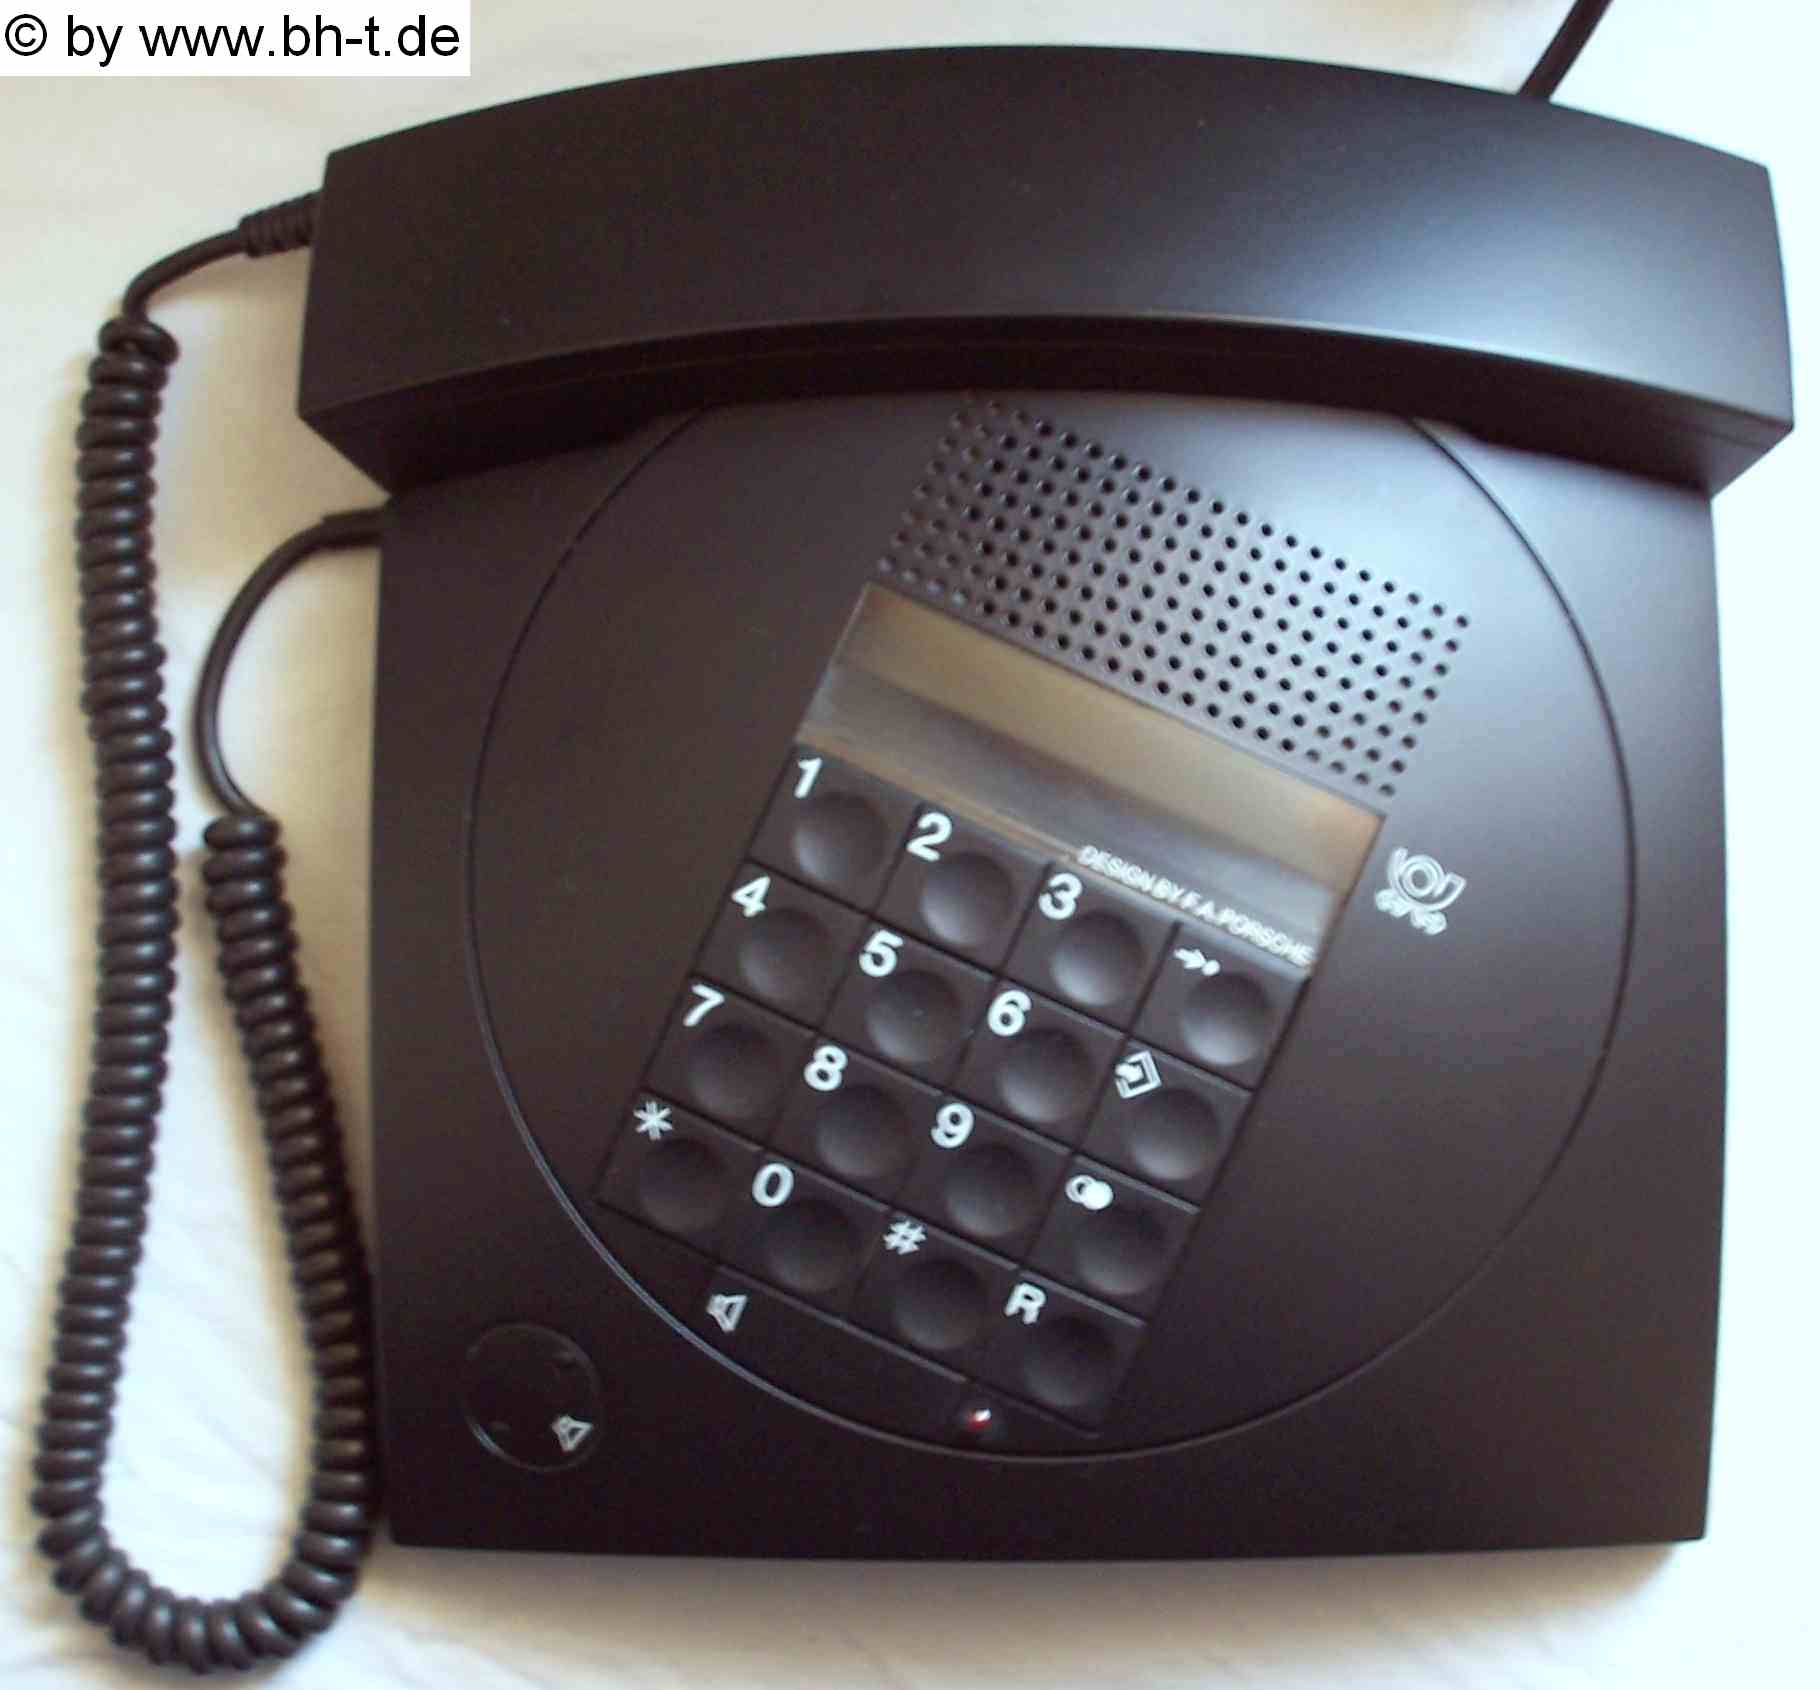 Telefonsammlung 1990 Bis 1999